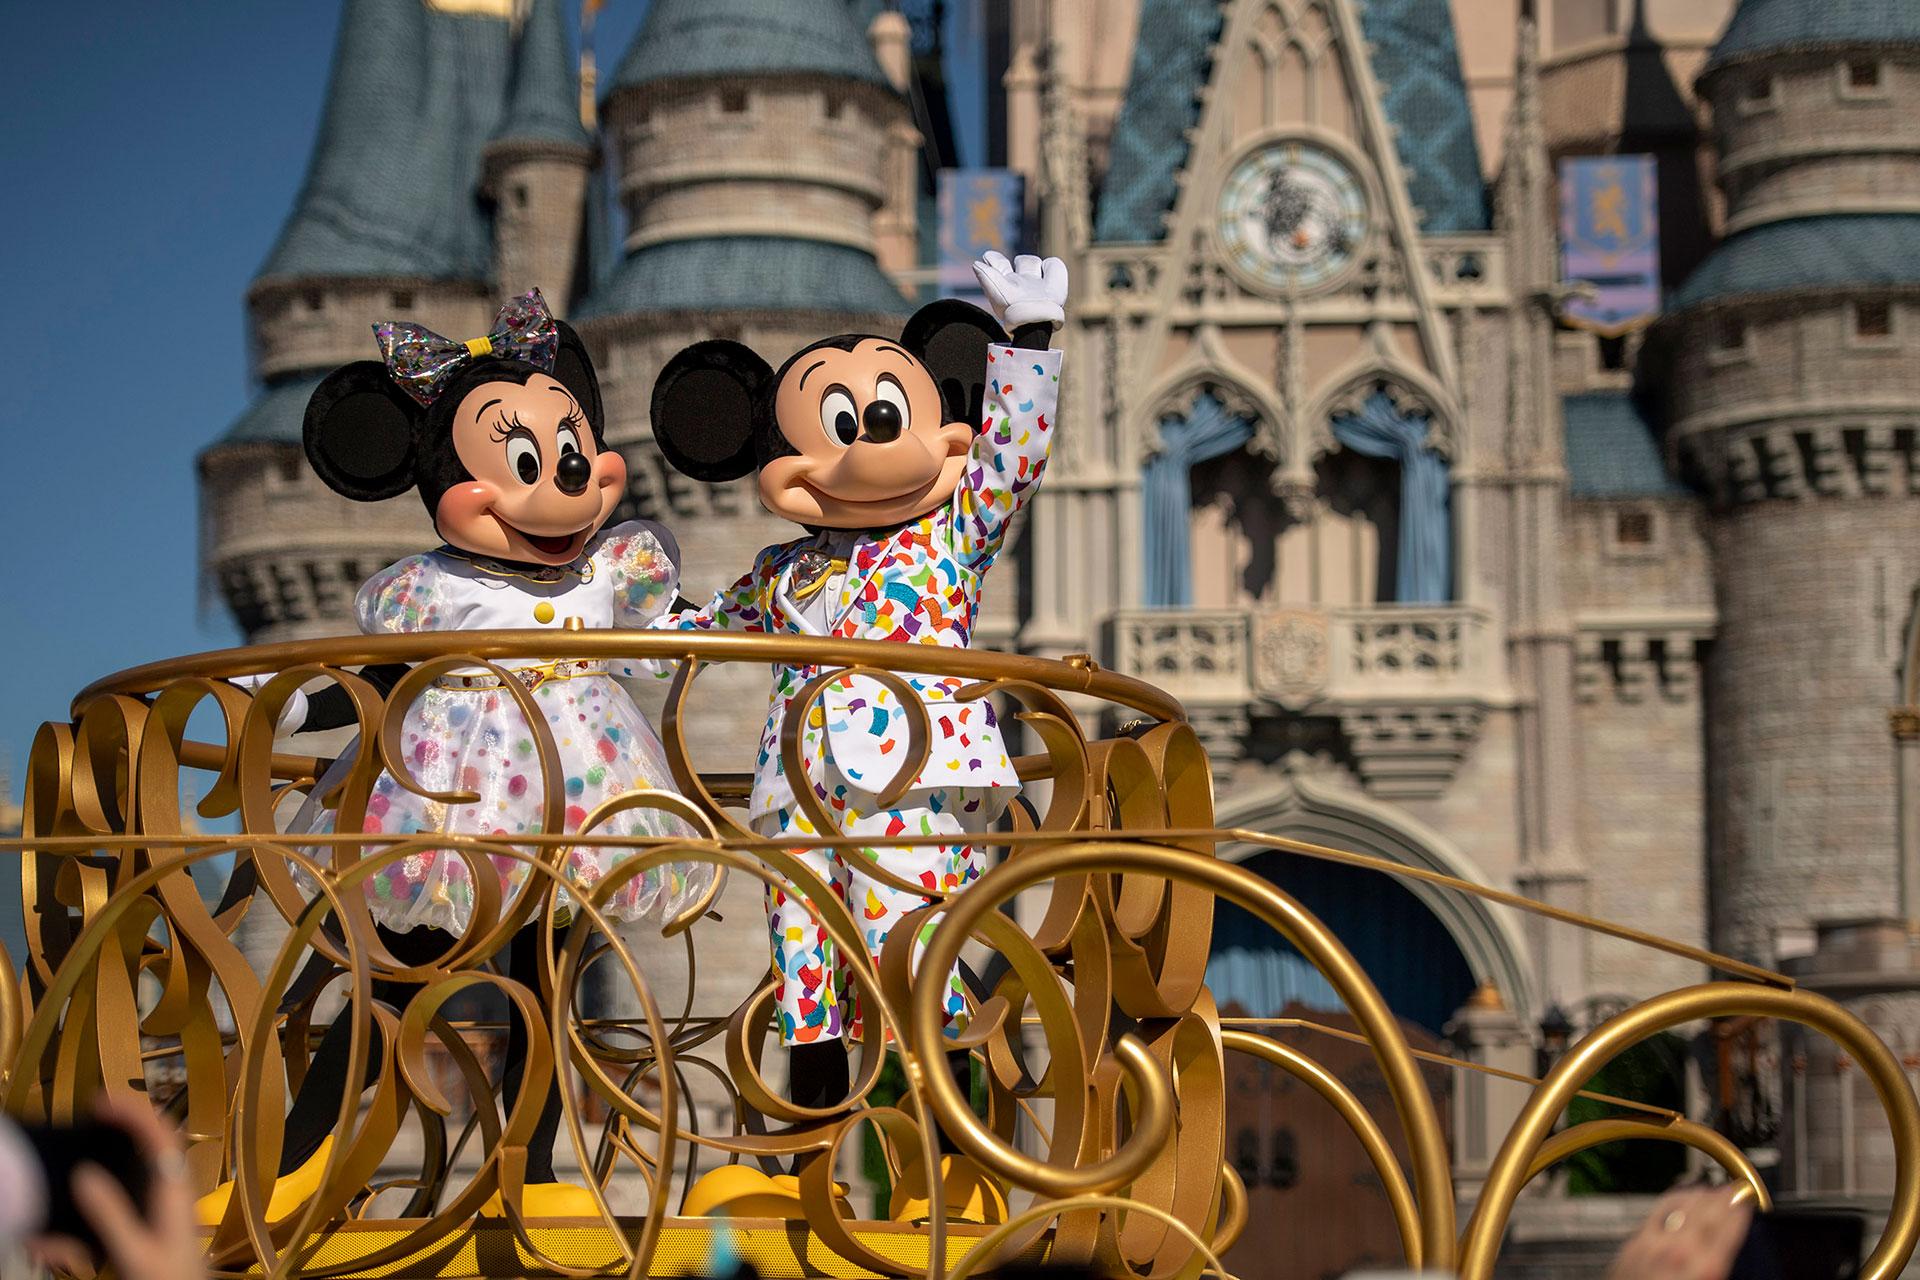 Diney world; Courtesy of Walt Disney World